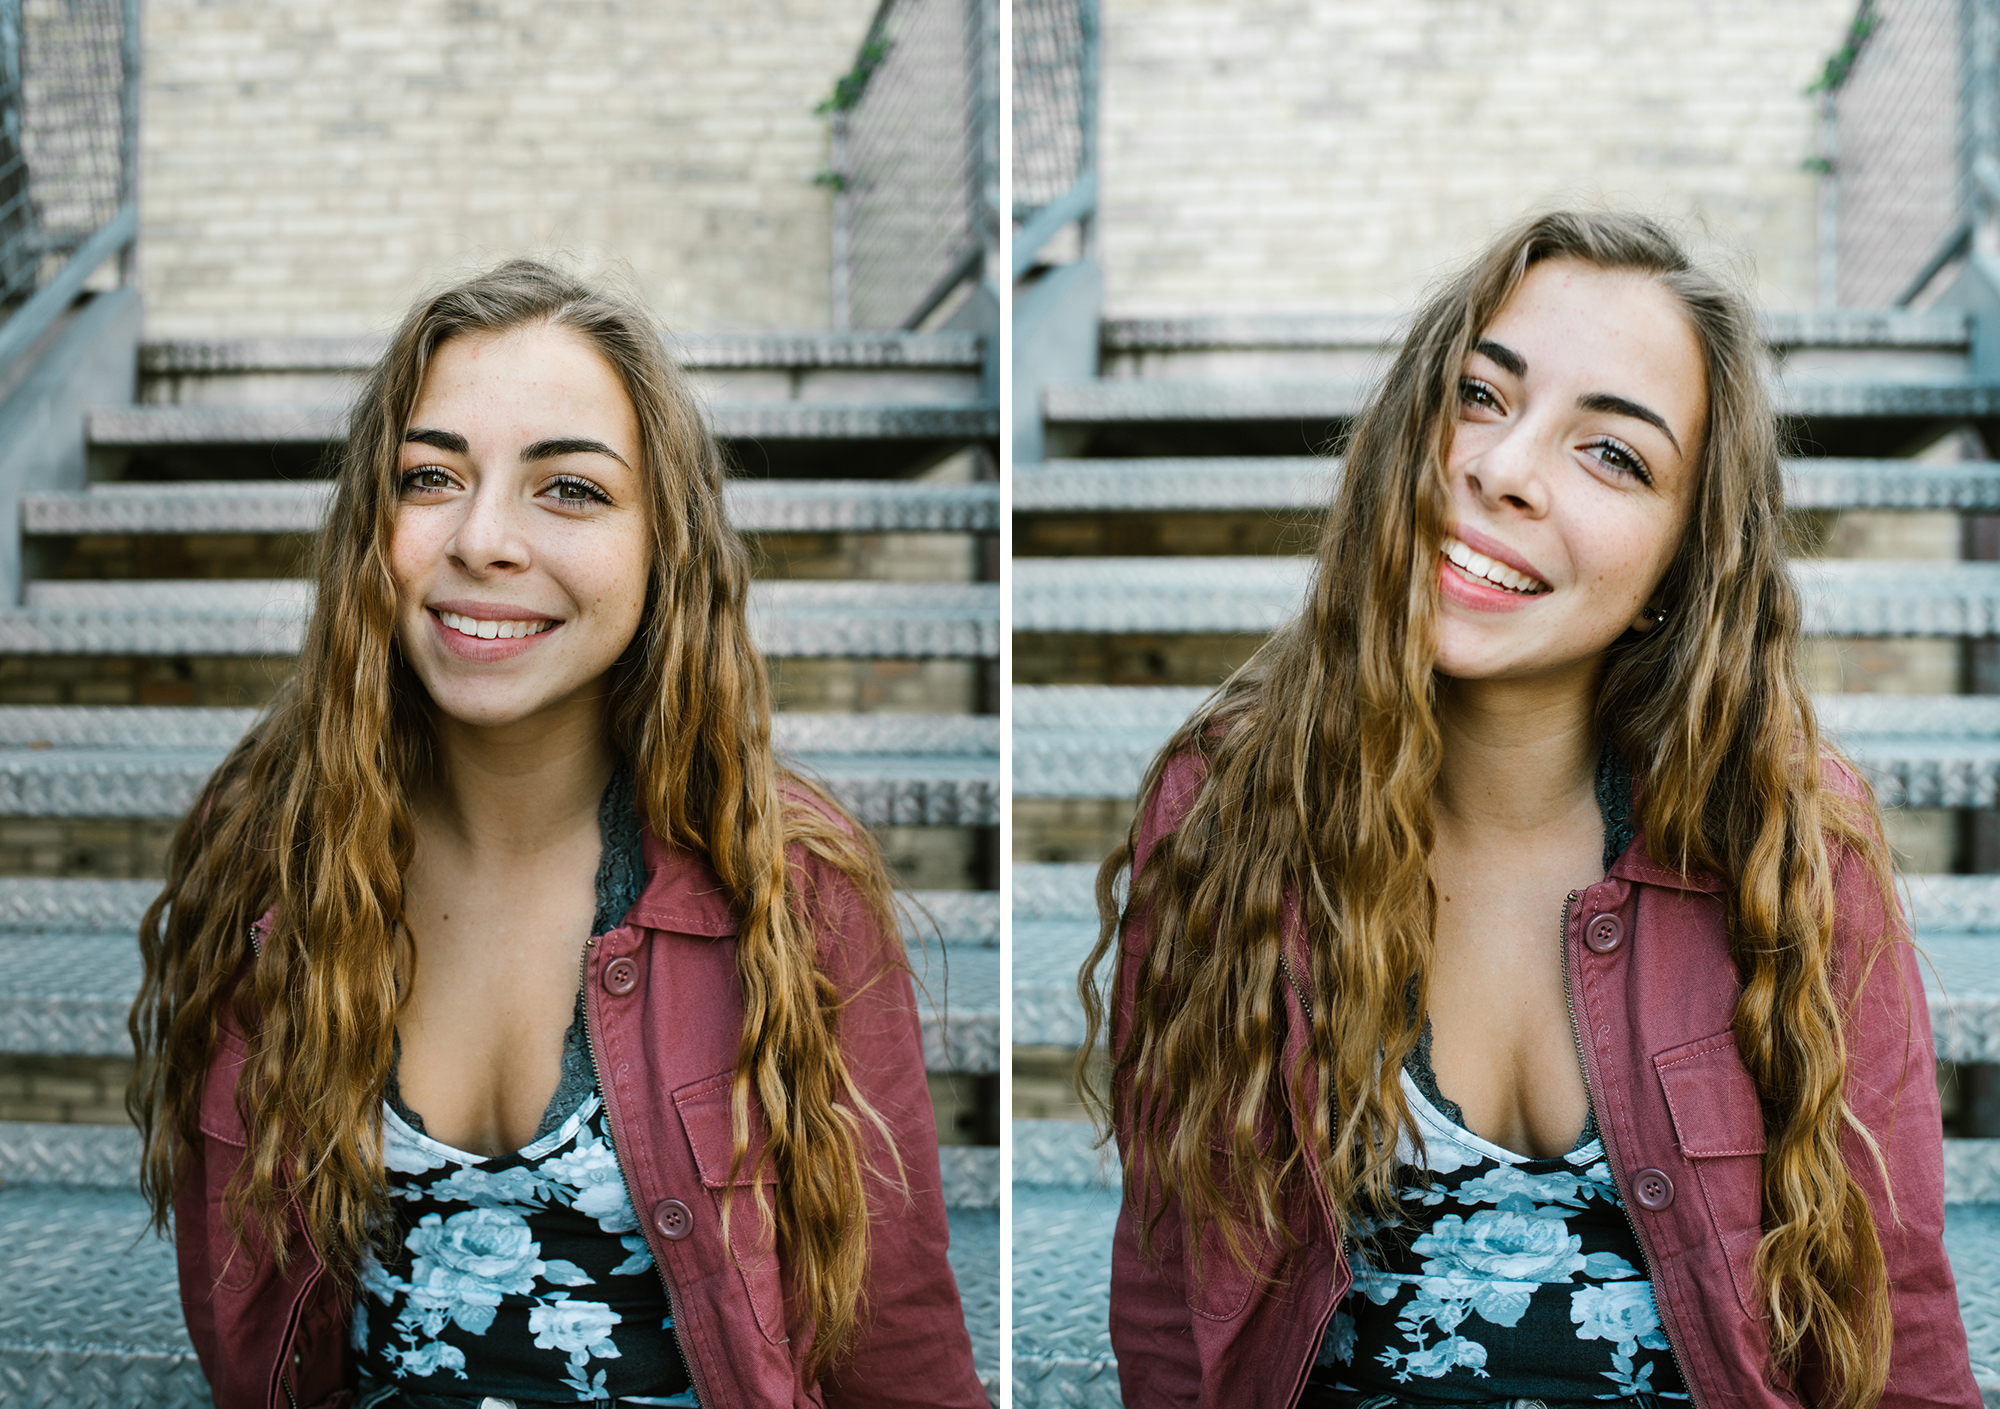 grand-haven-high-school-senior-photographer-sydney-marie.png